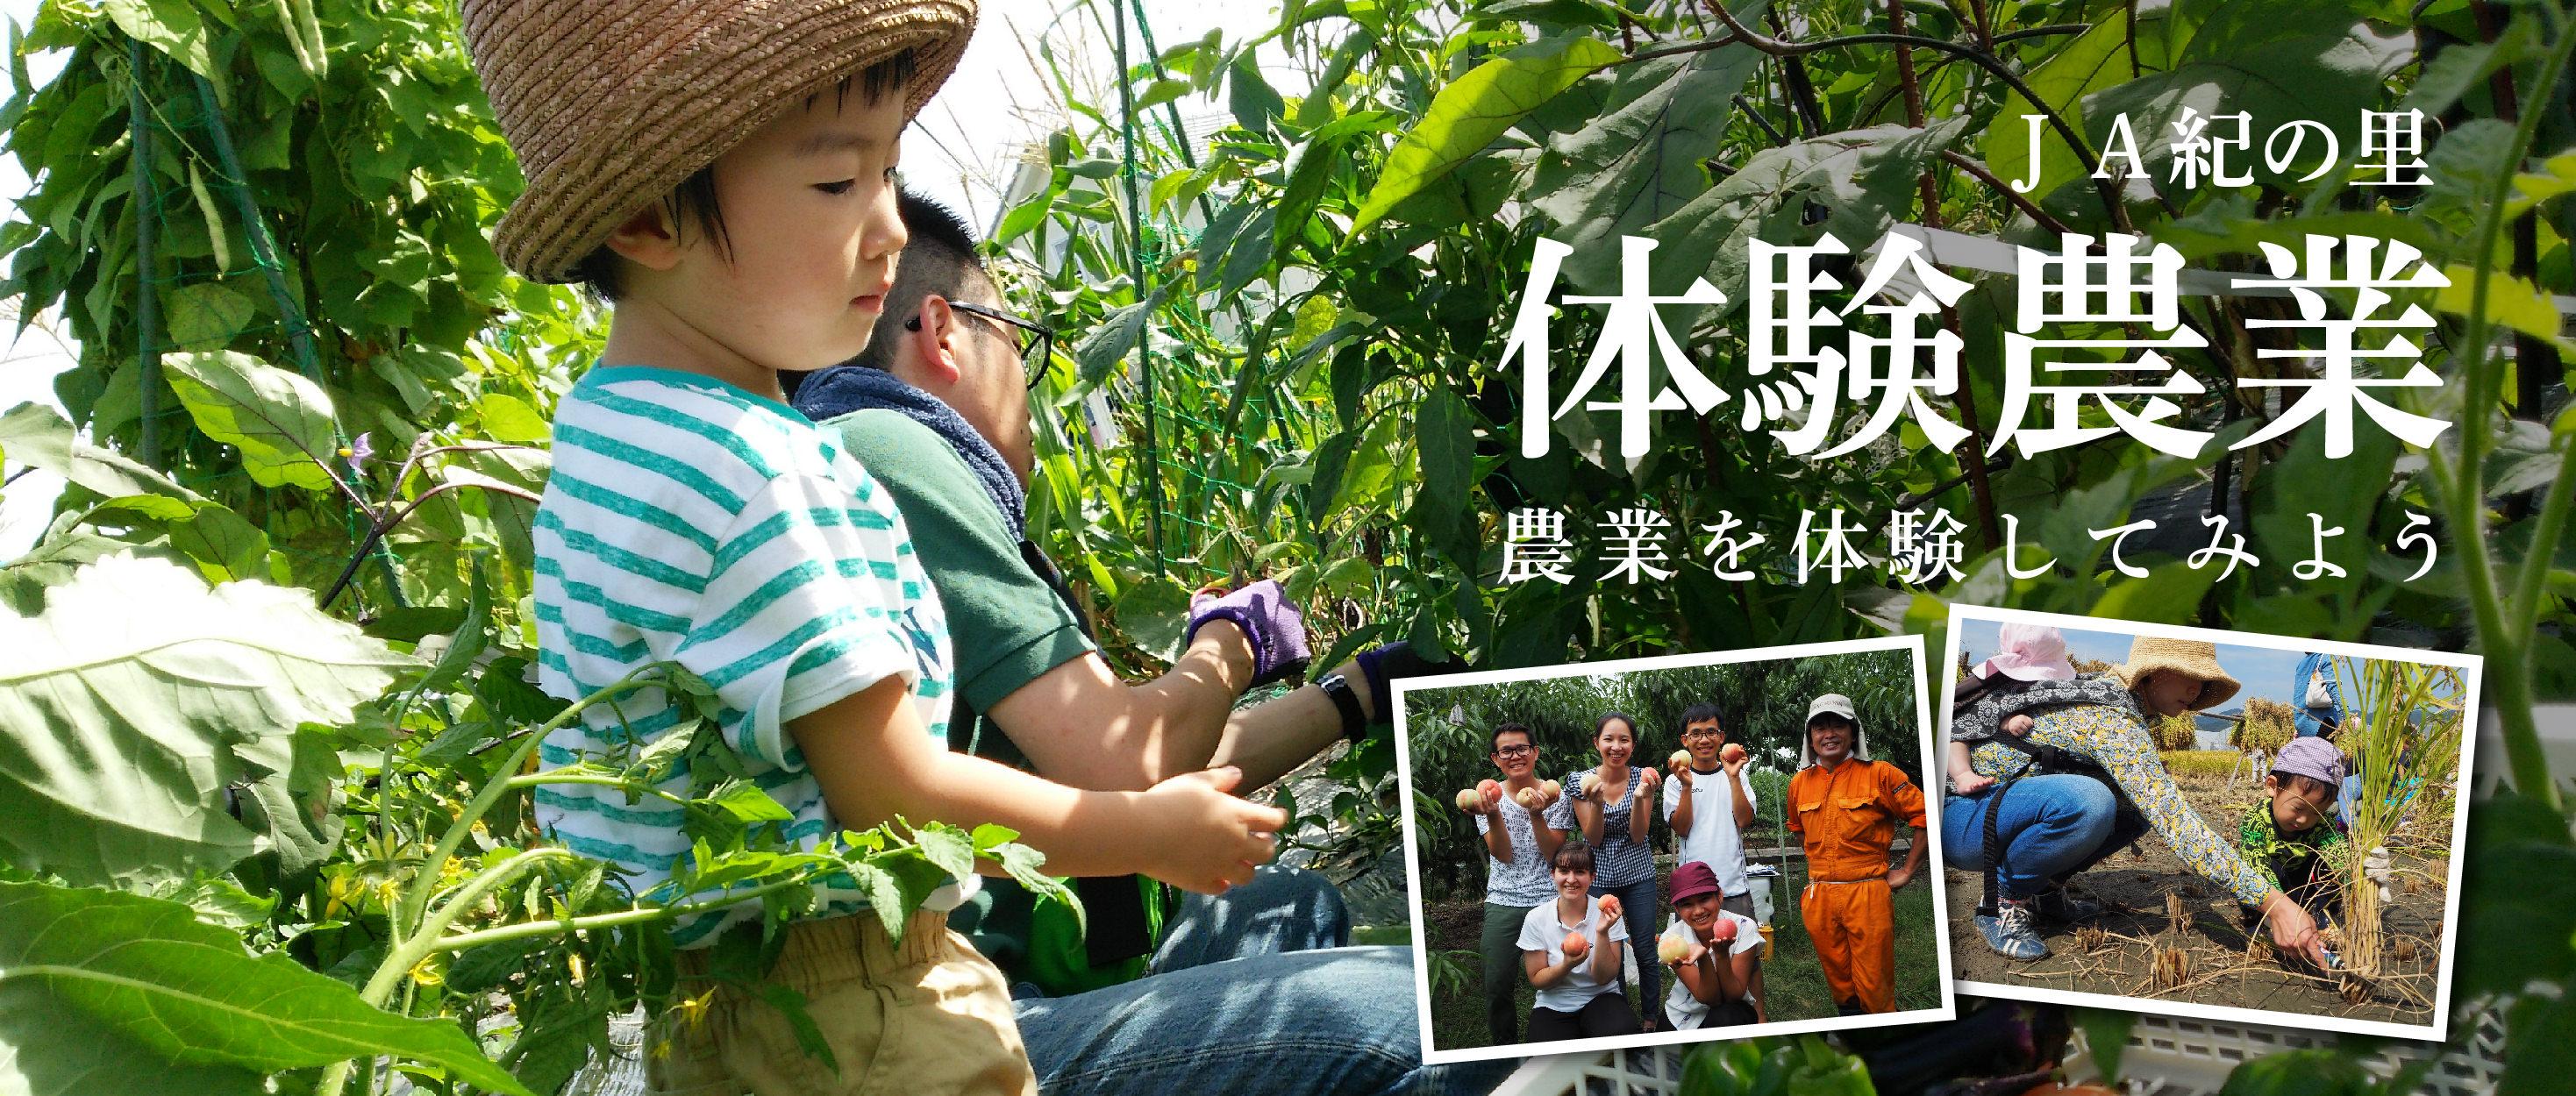 JA紀の里 体験農業 農業を体験してみよう